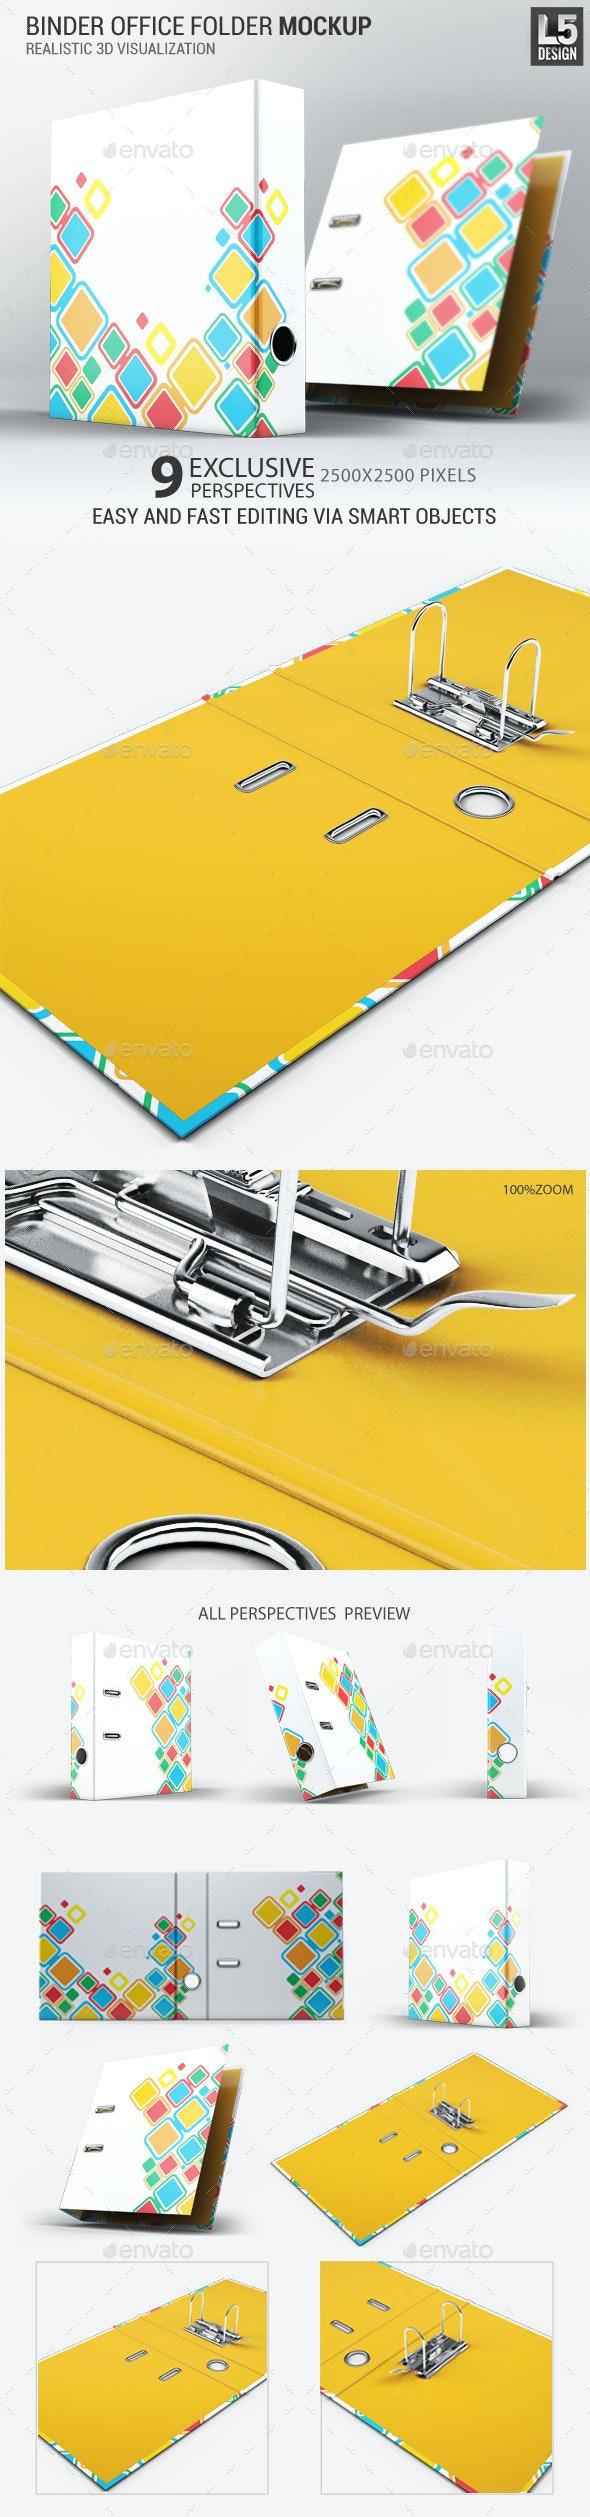 Binder Office Folder Mock-Up - Stationery Print